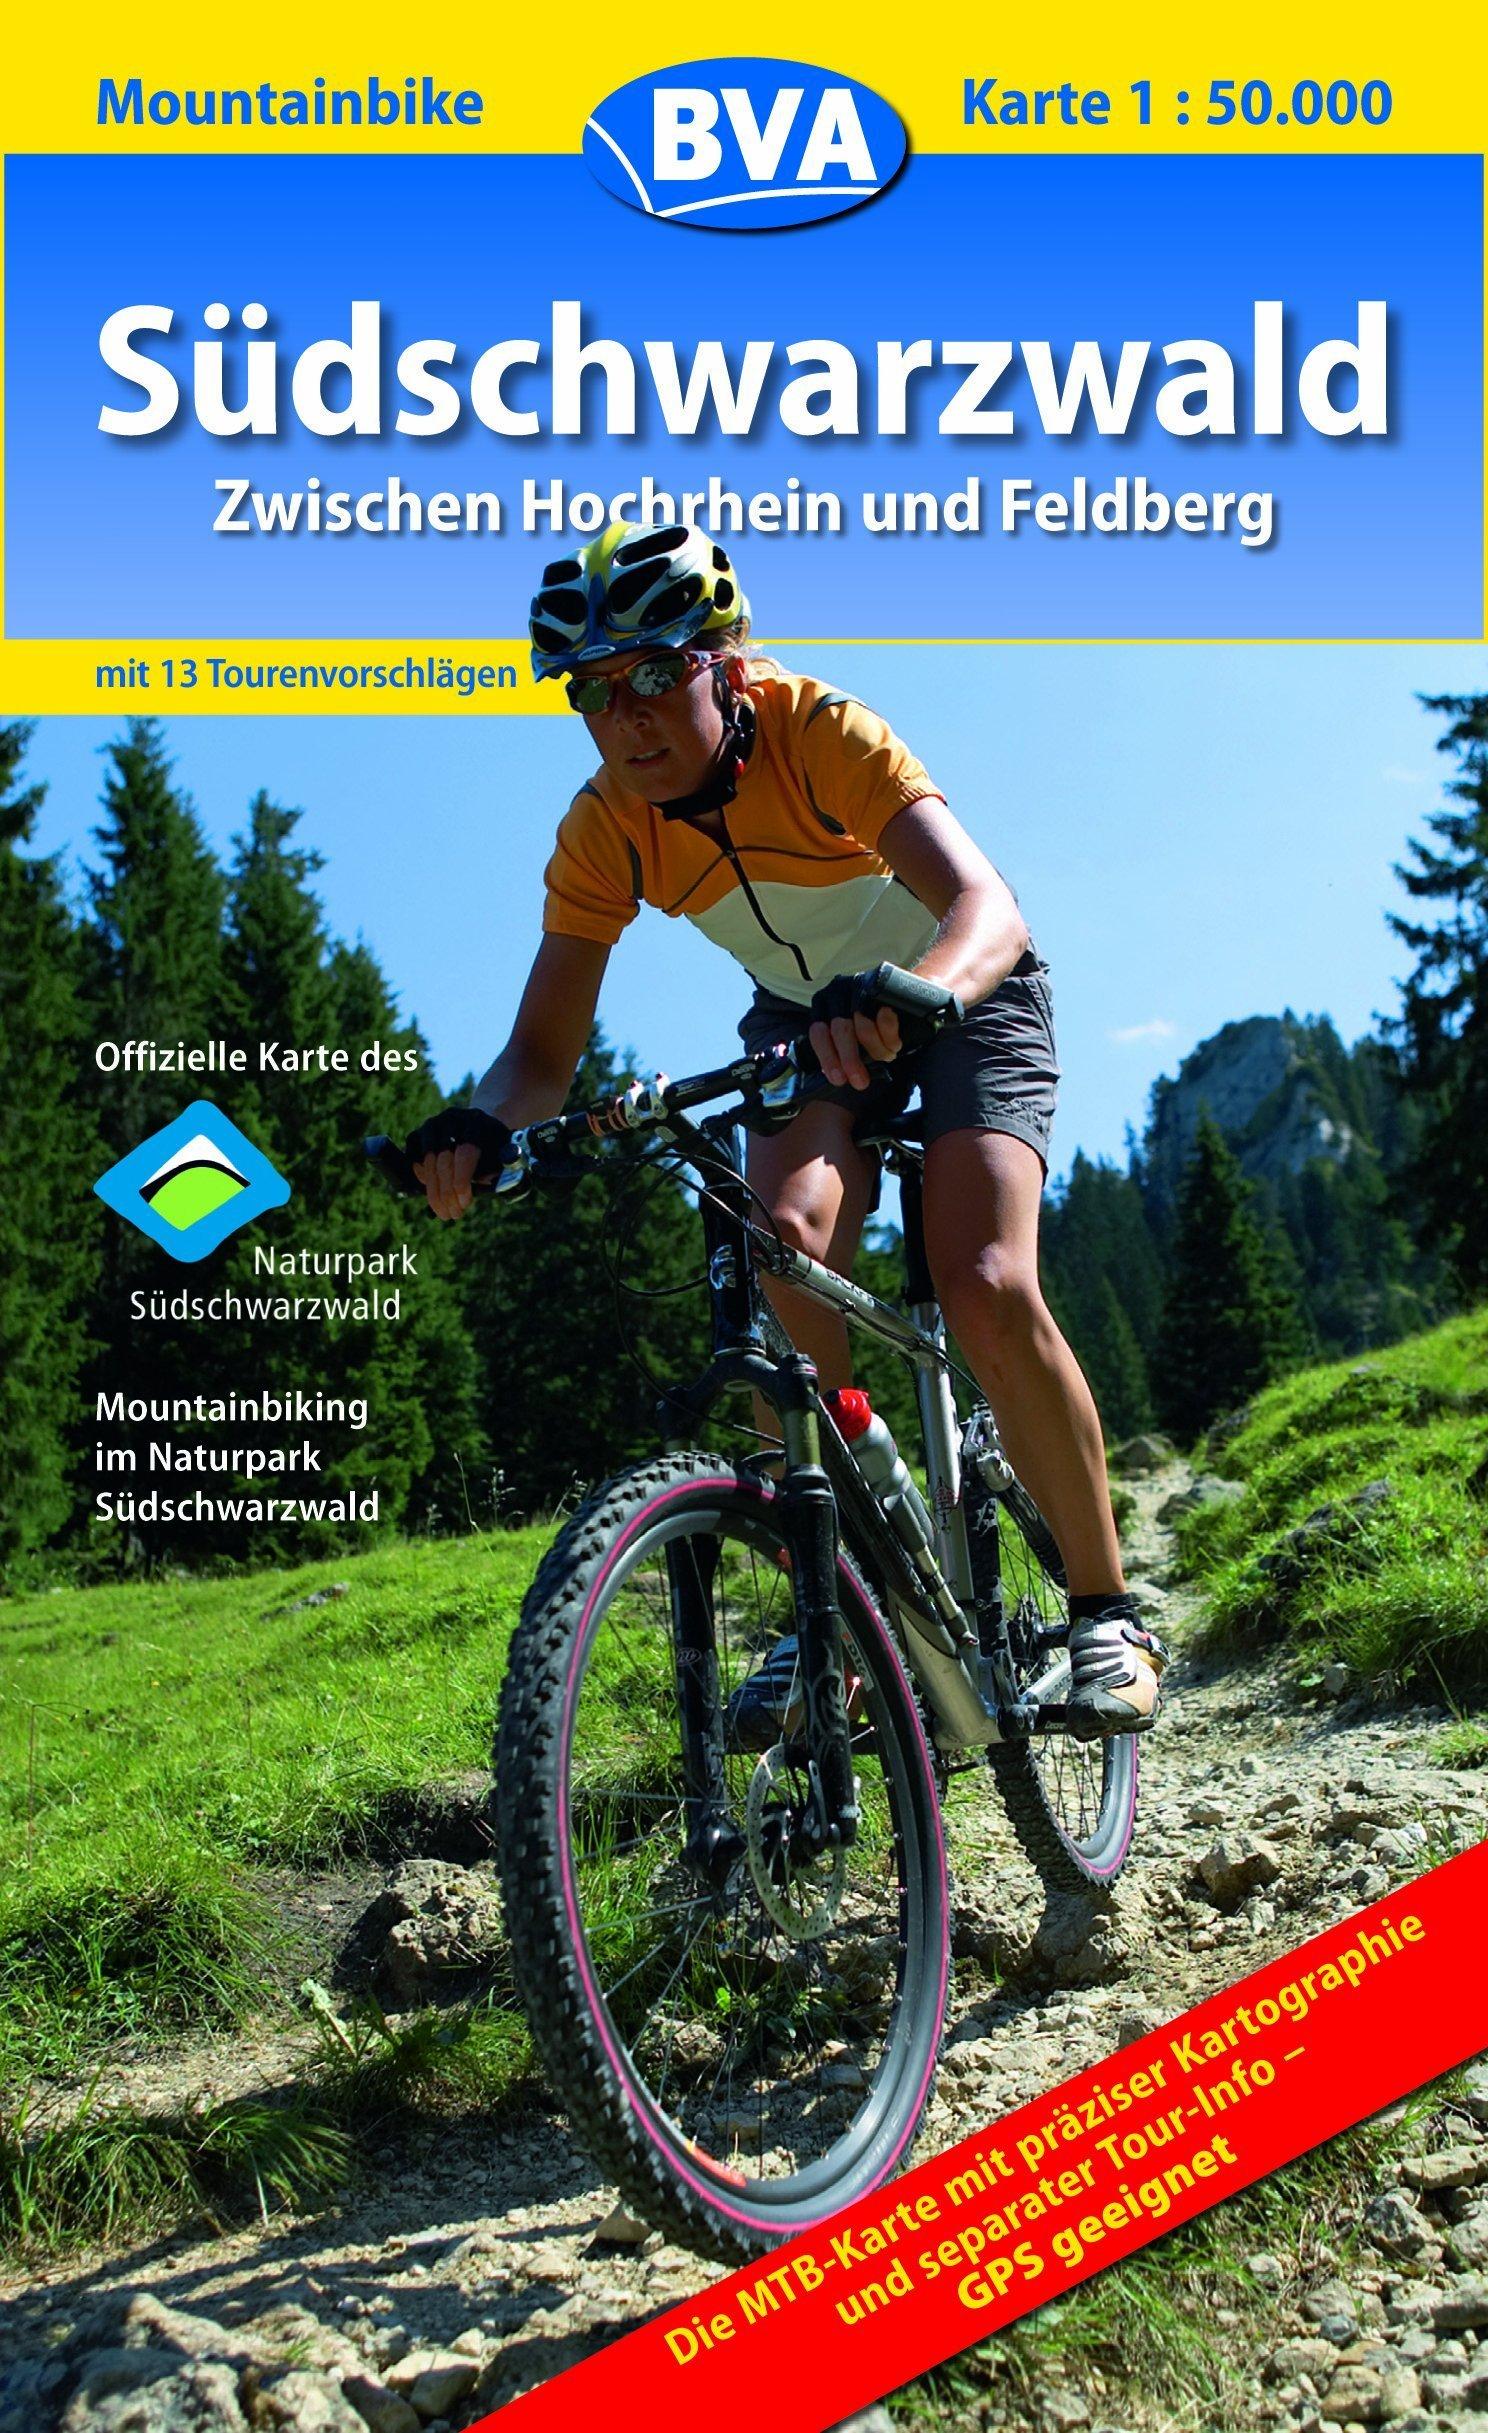 Südschwarzwald: Mountainbike-Karte Maßstab 1:50000